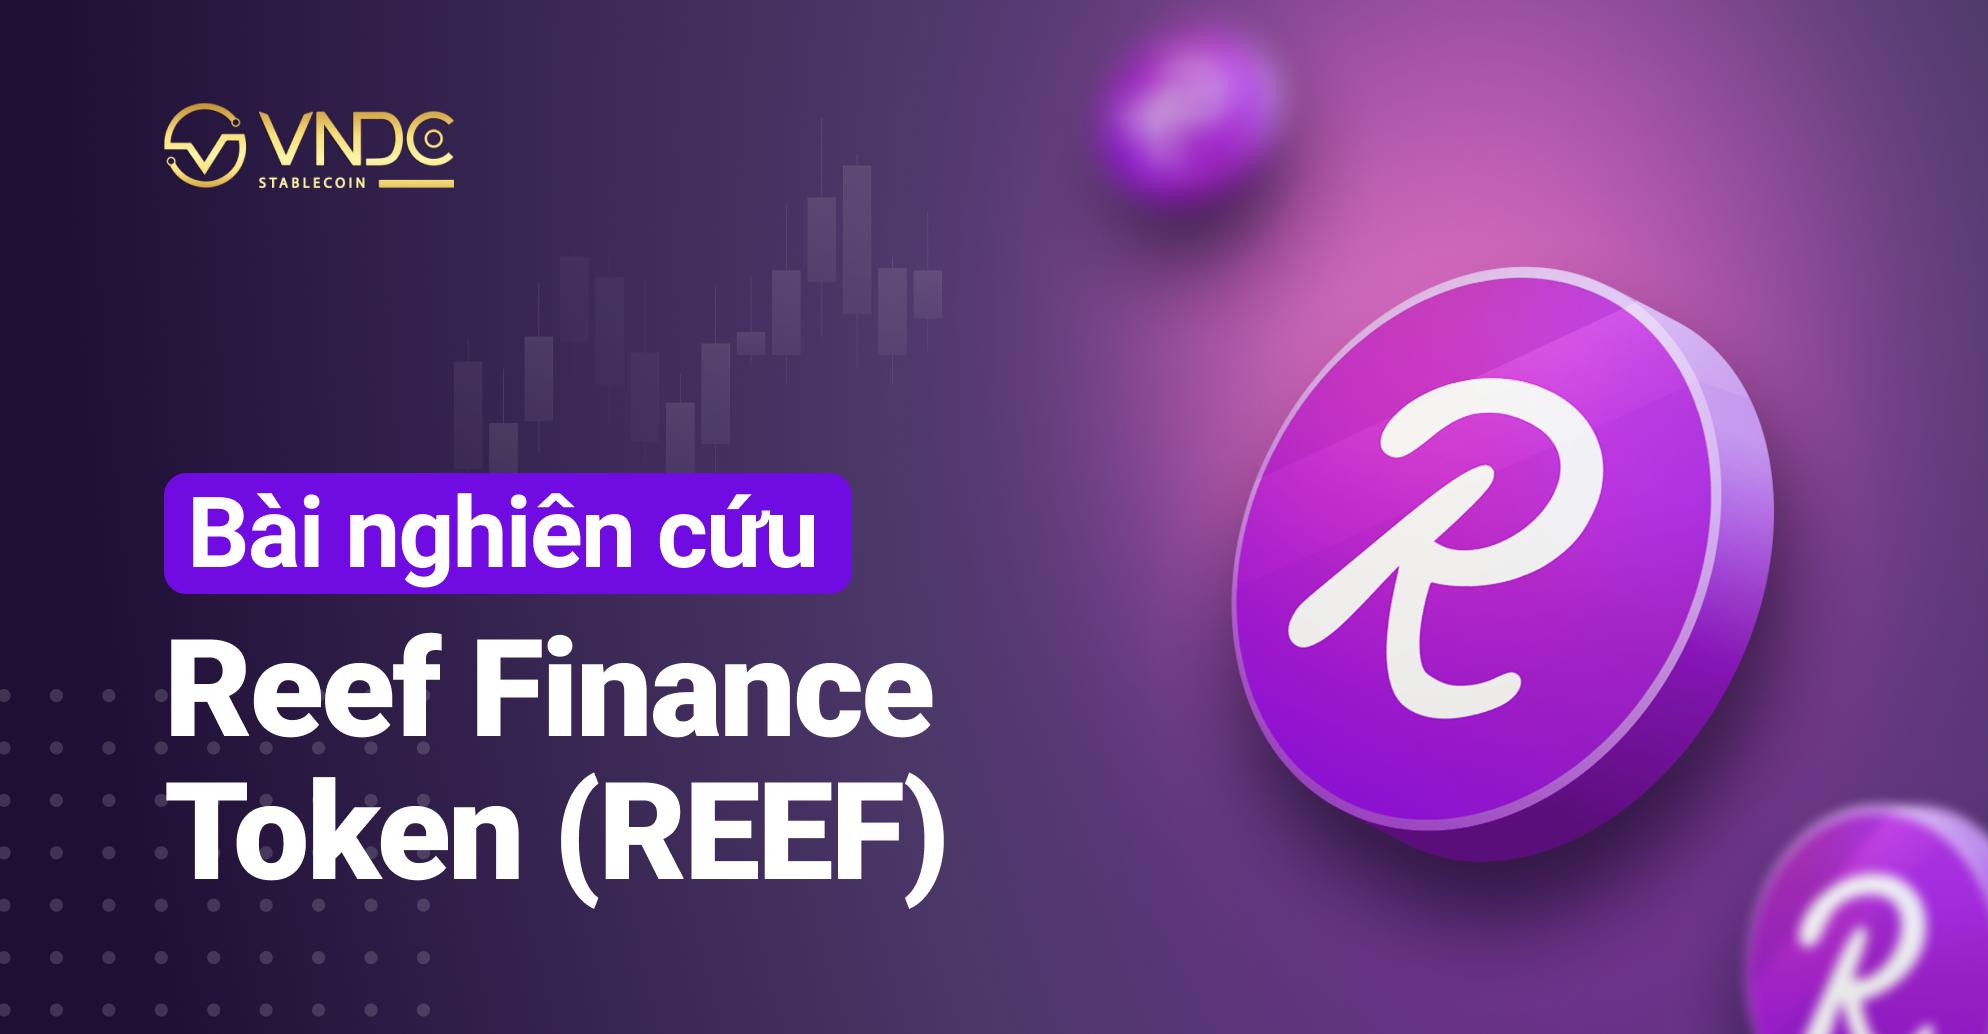 Bài nghiên cứu về Reef Finance Token (REEF)